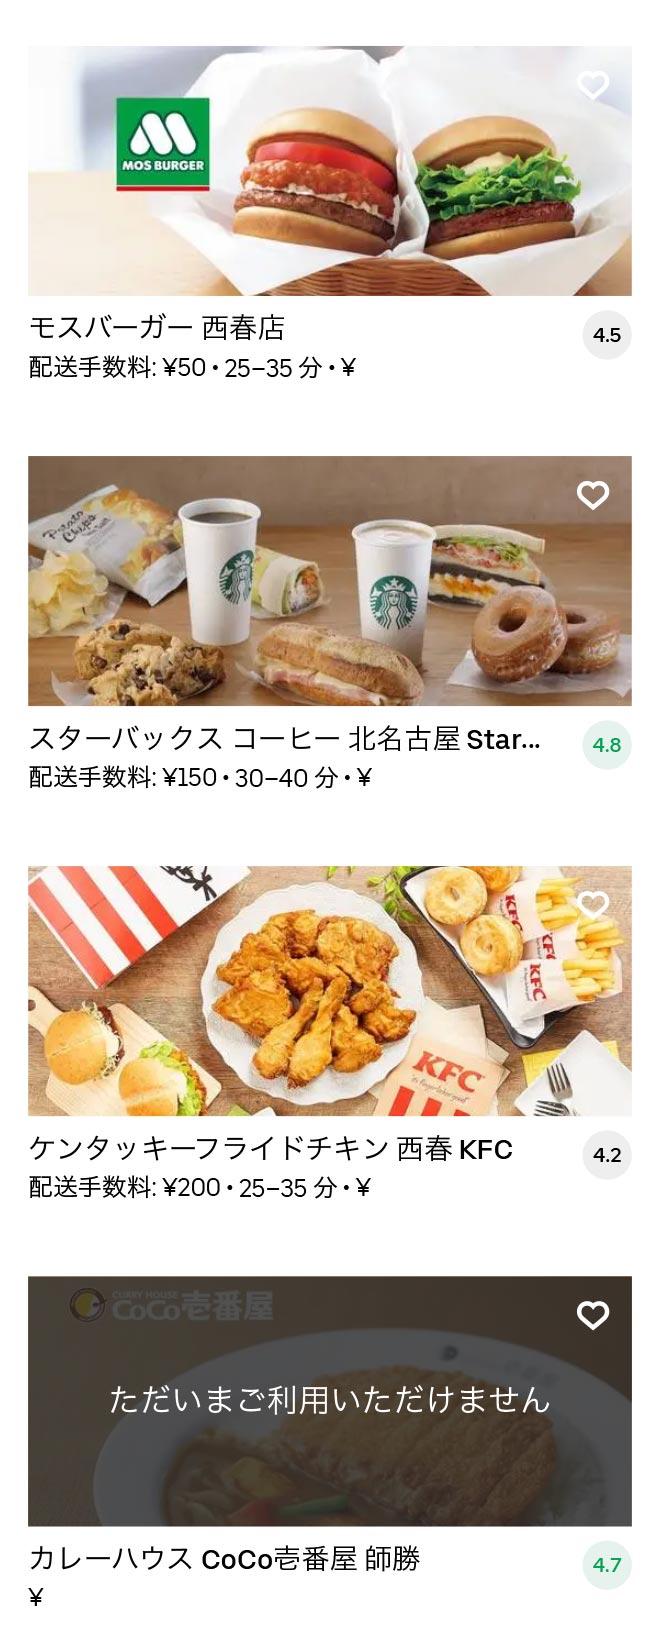 Nishiharu menu 2010 05